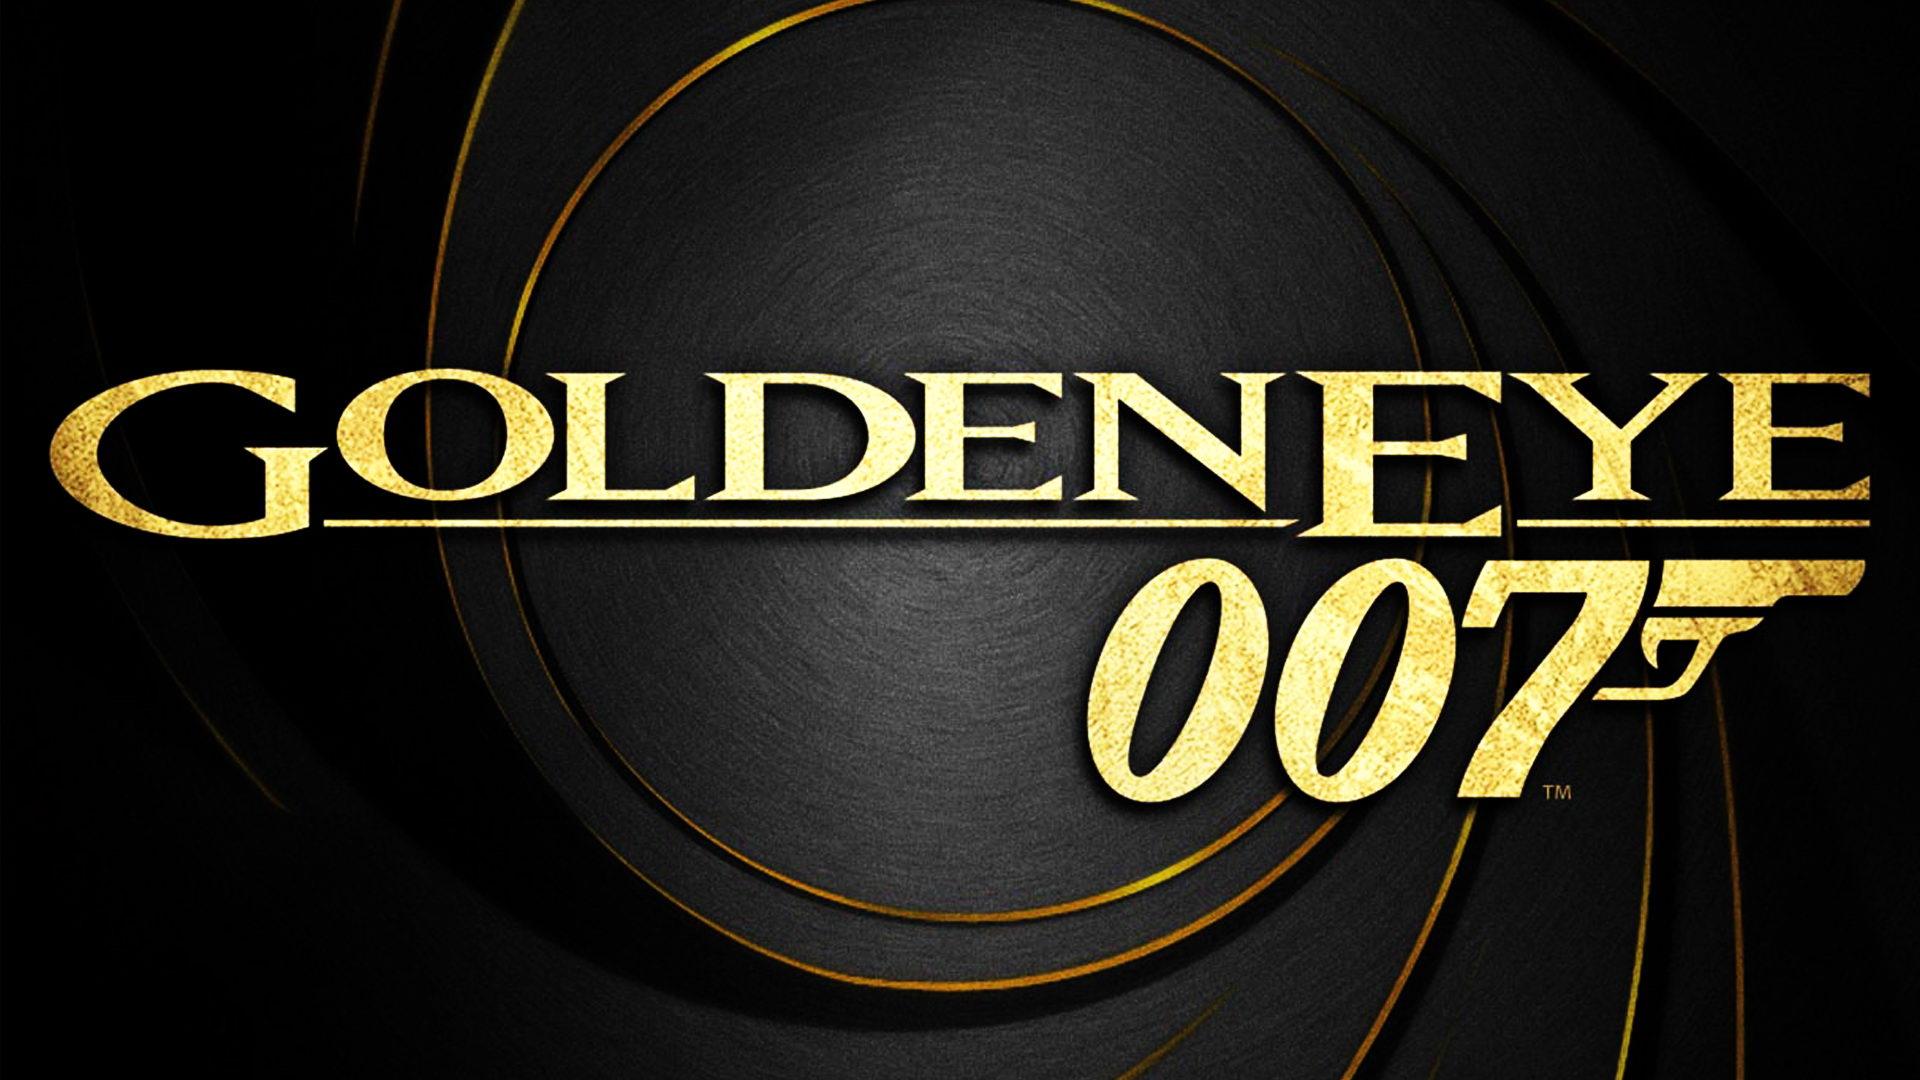 James Bond Iphone Wallpaper Download Free 007 Backgrounds Pixelstalk Net